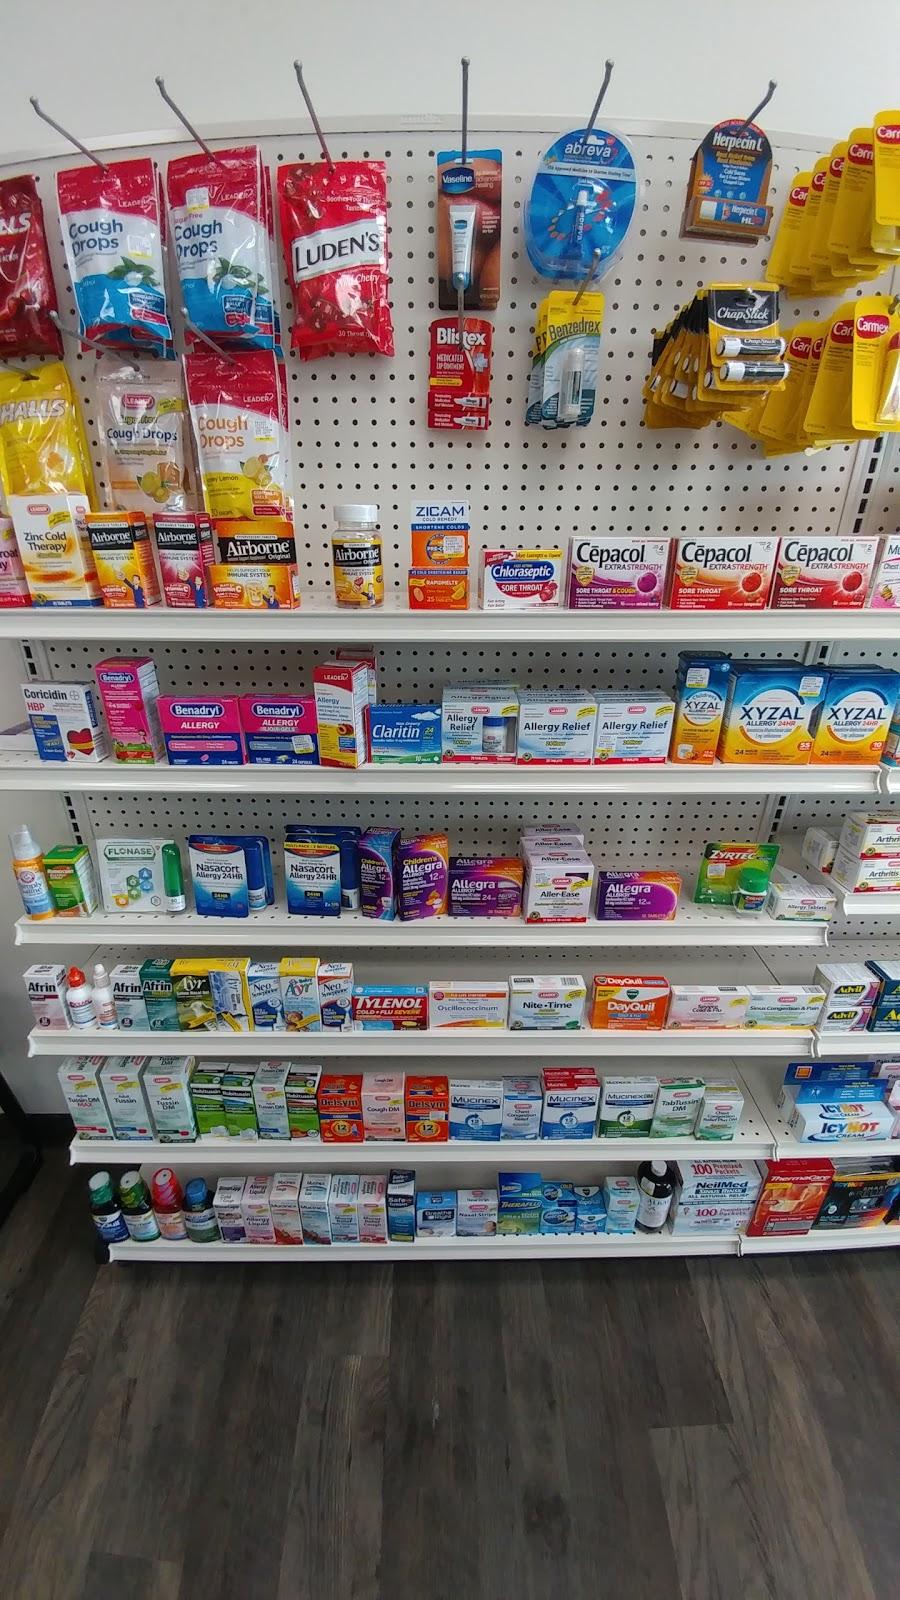 Frisco Pharmacy - pharmacy  | Photo 9 of 10 | Address: 14550 TX-121 STE 150, Frisco, TX 75035, USA | Phone: (469) 305-7058